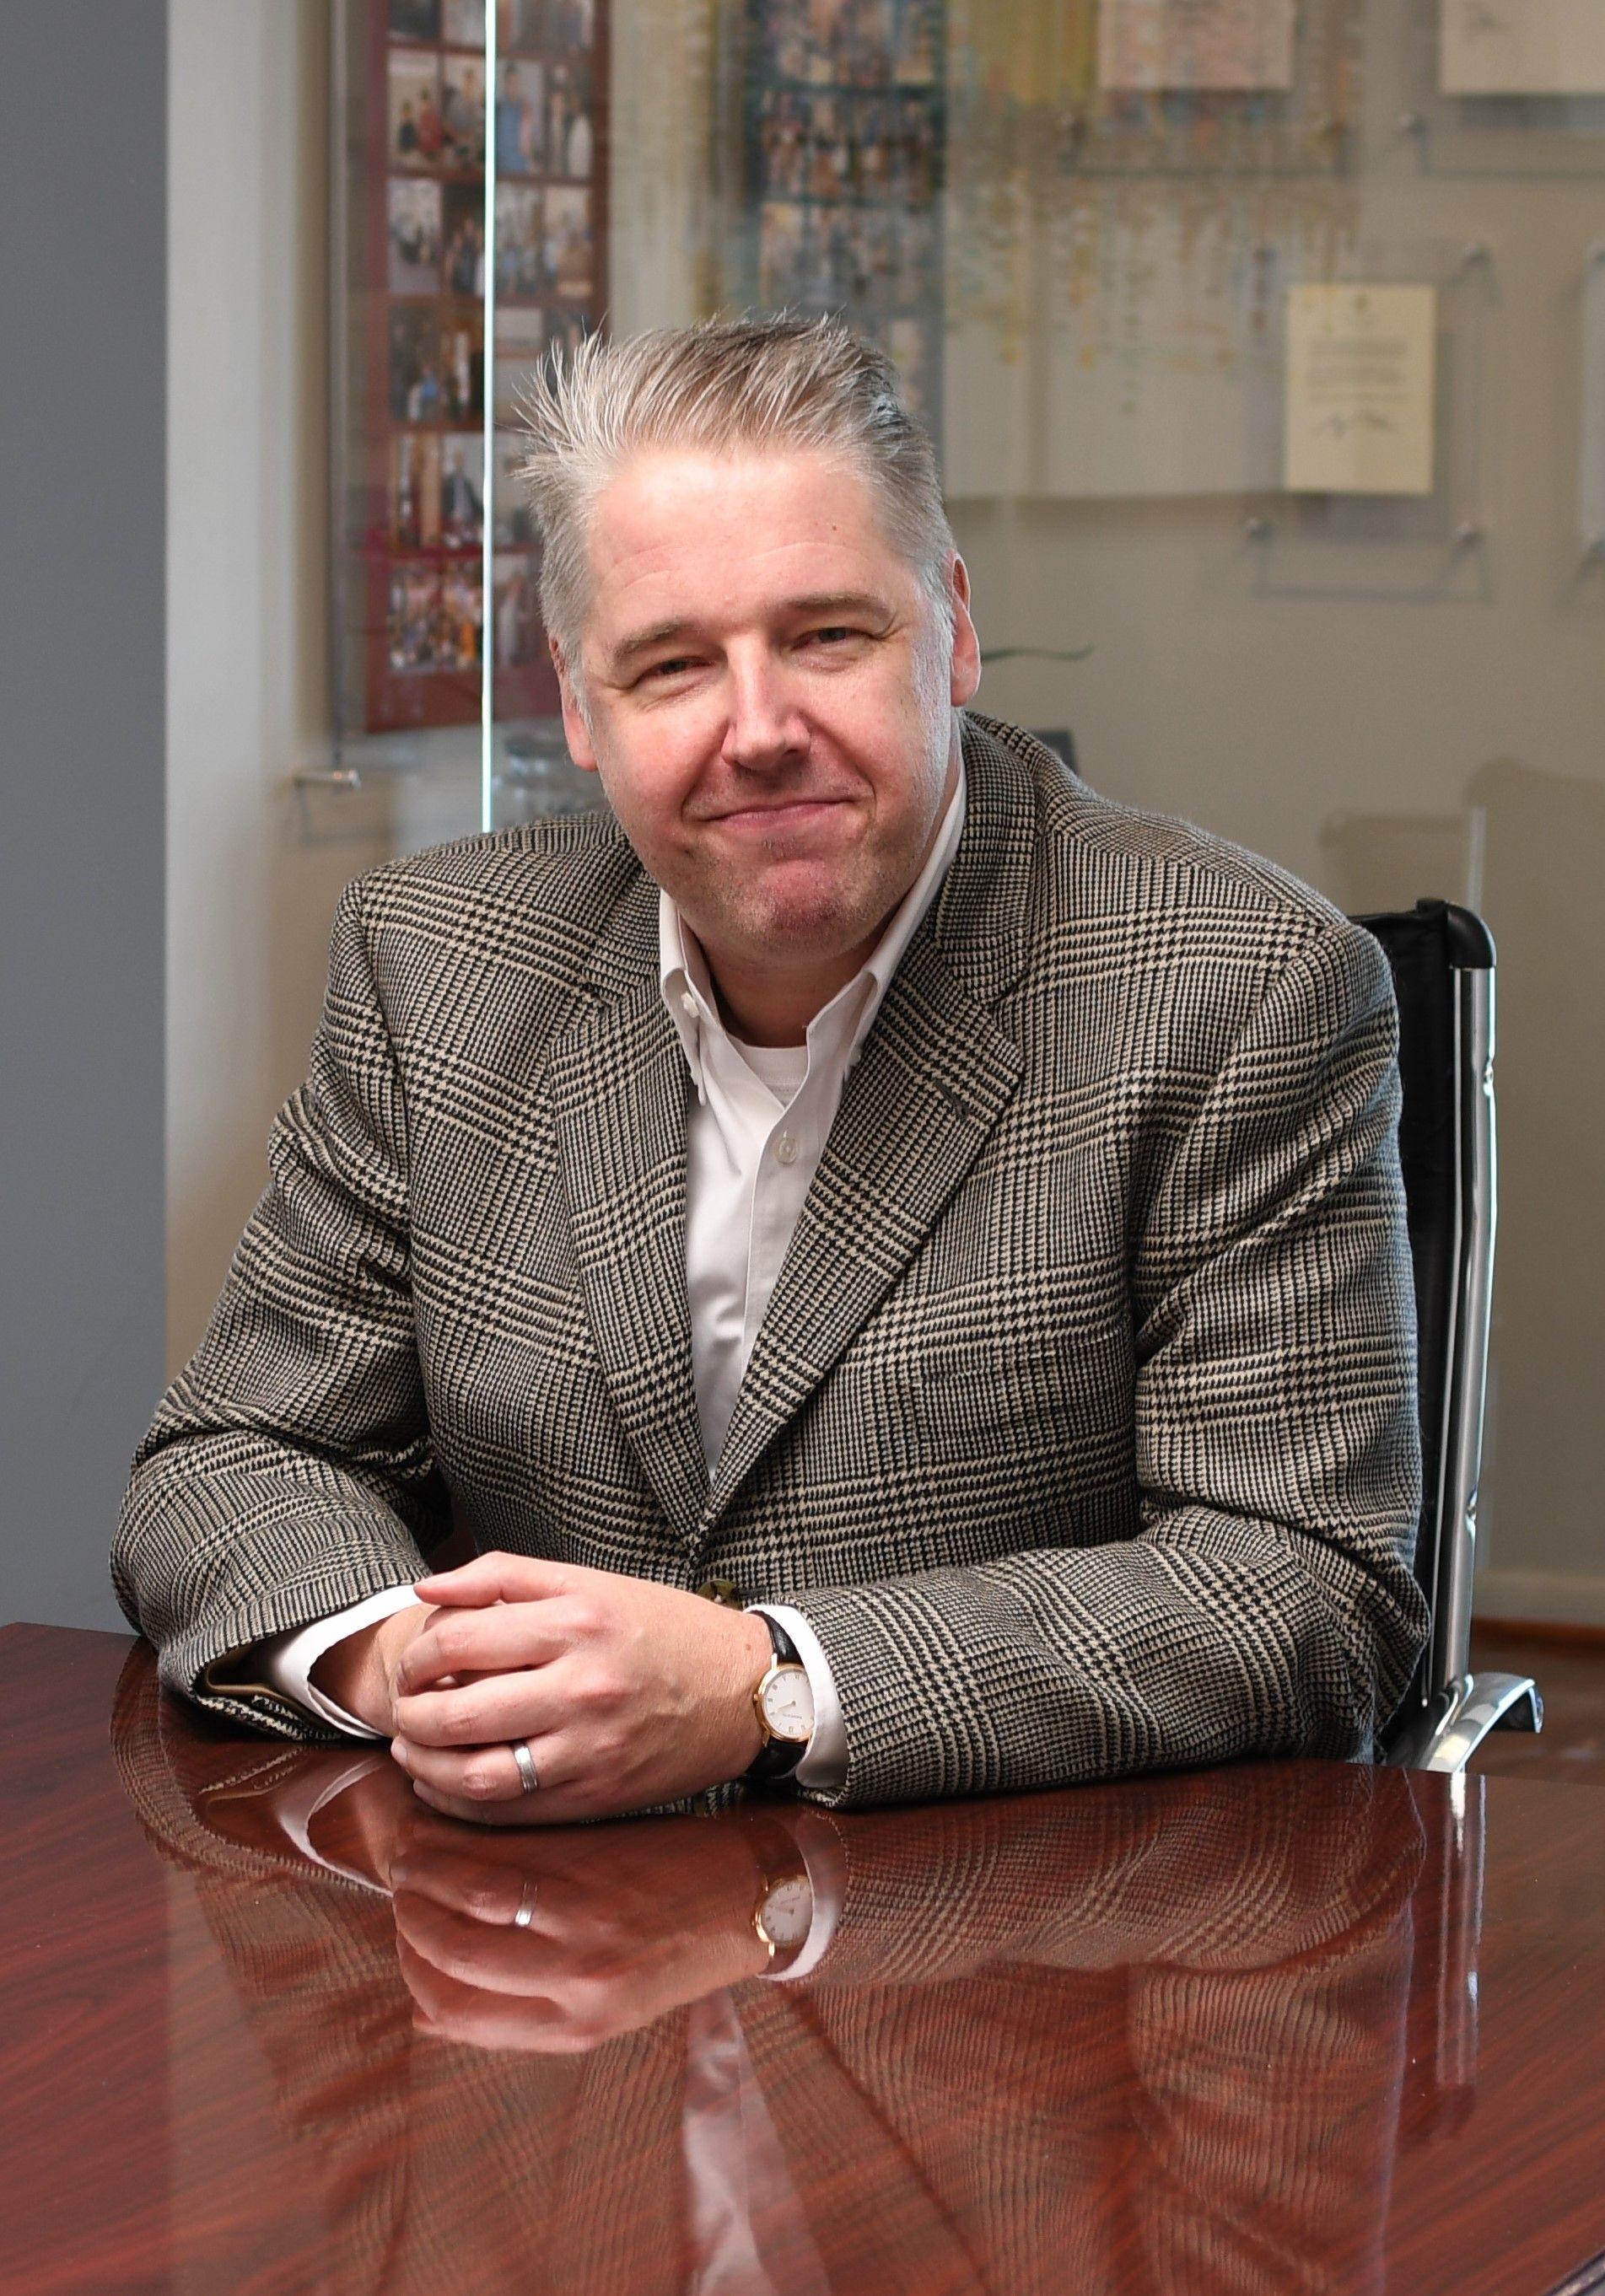 Michael McAuliffe